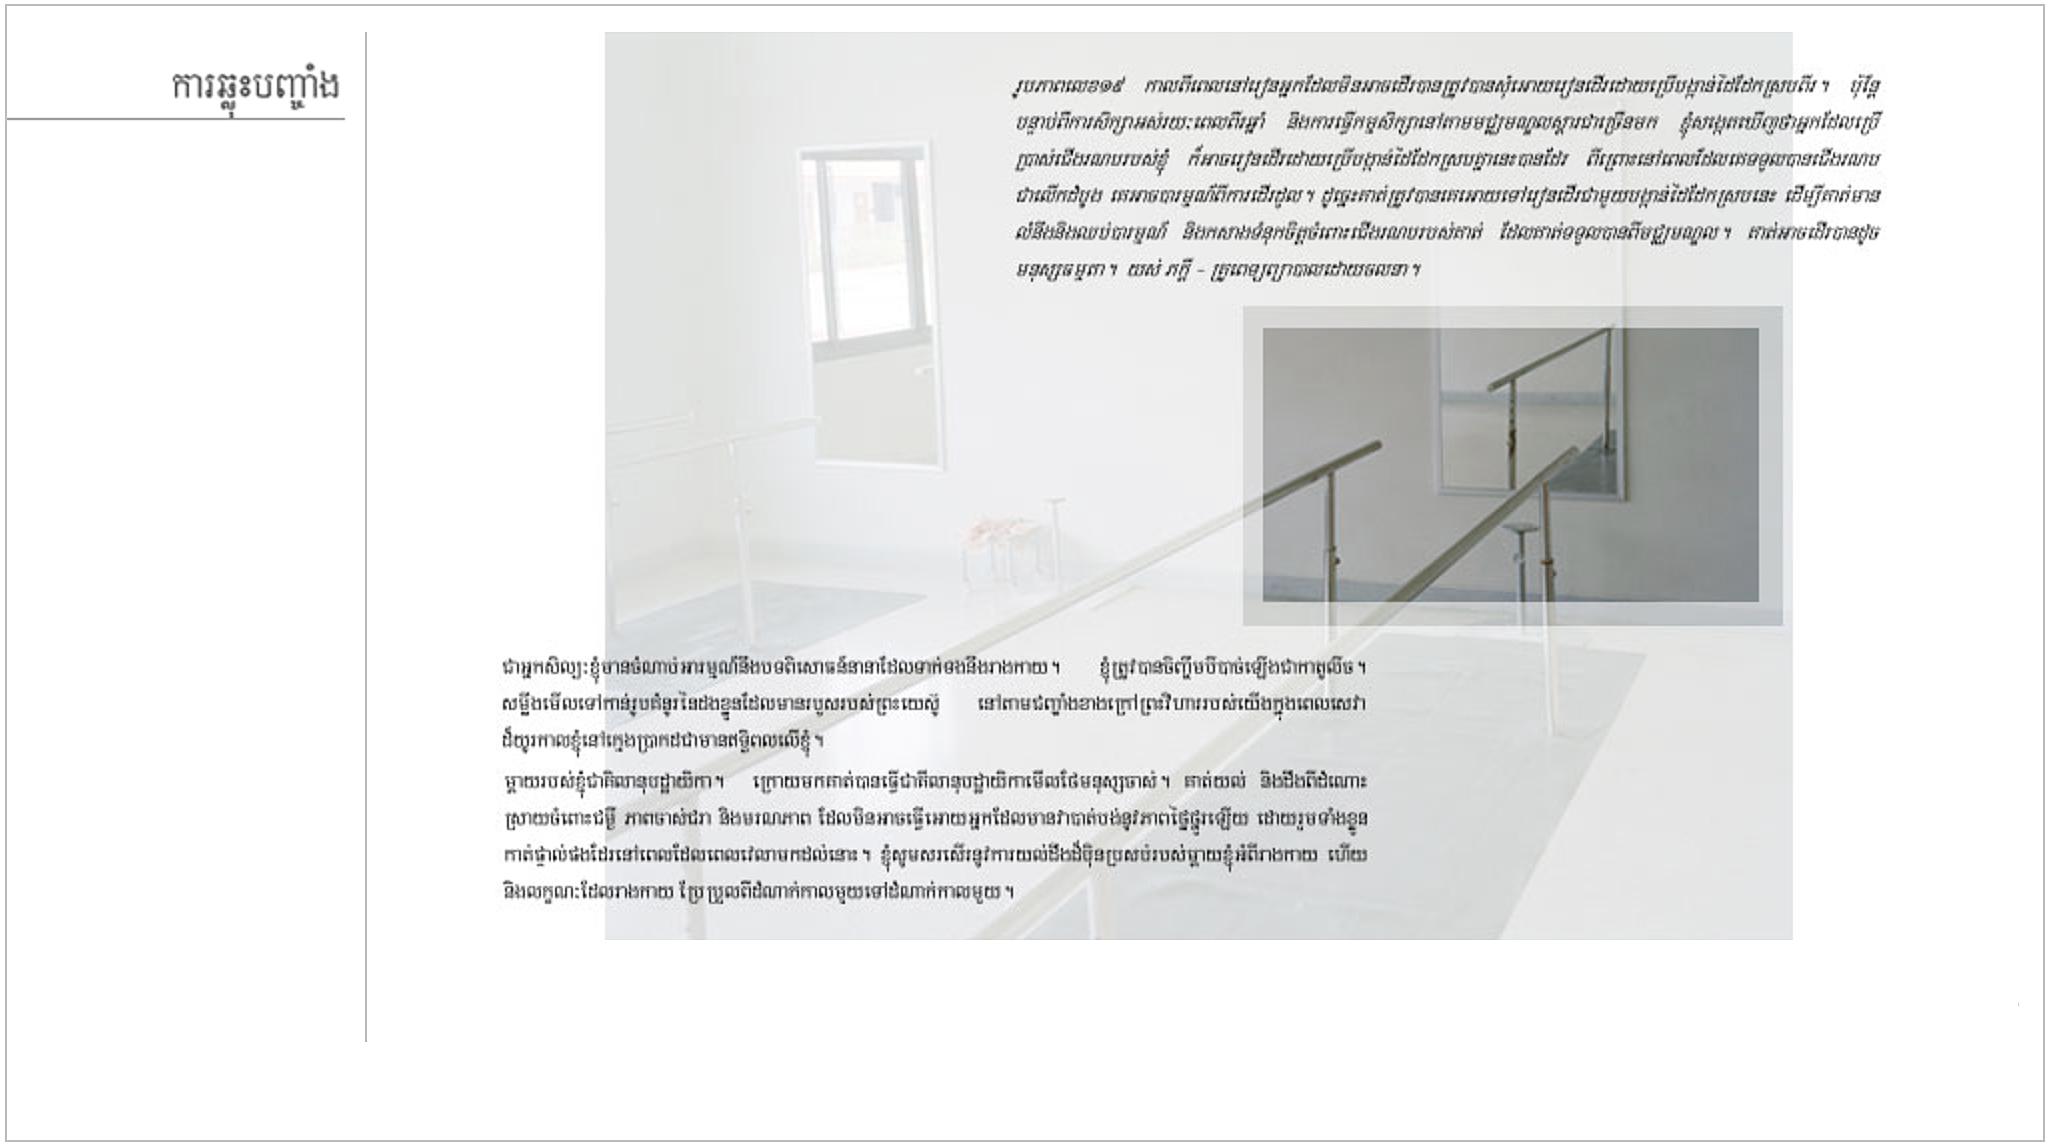 pg 53 copy.jpg